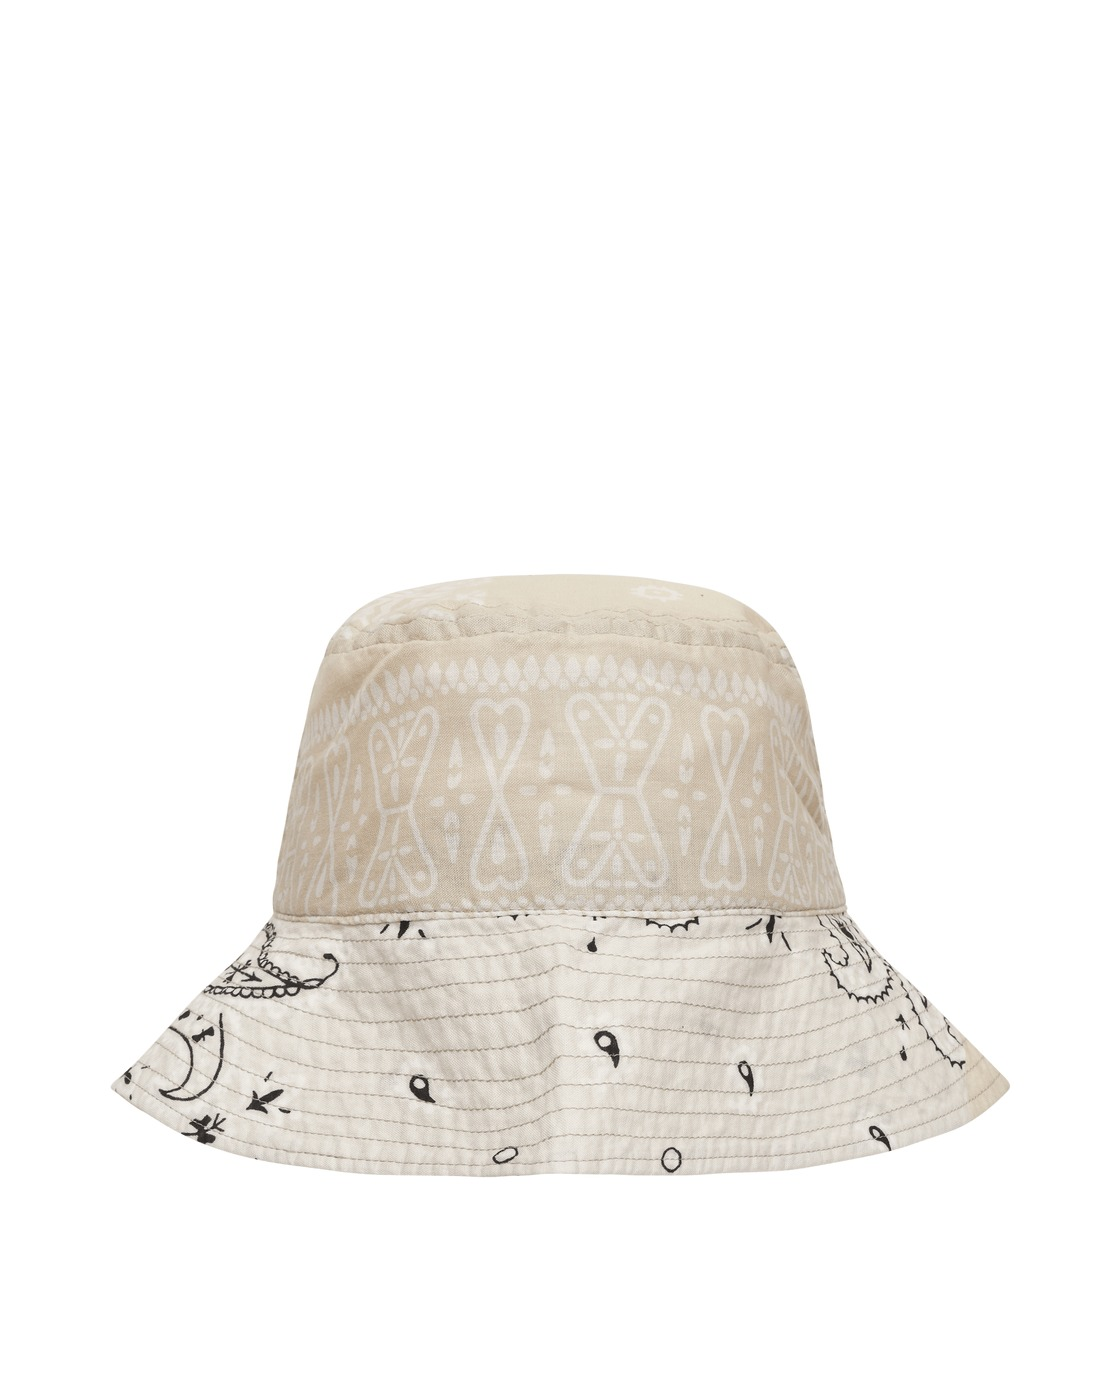 Kapital Bandana Patchwork Bucket Hat White